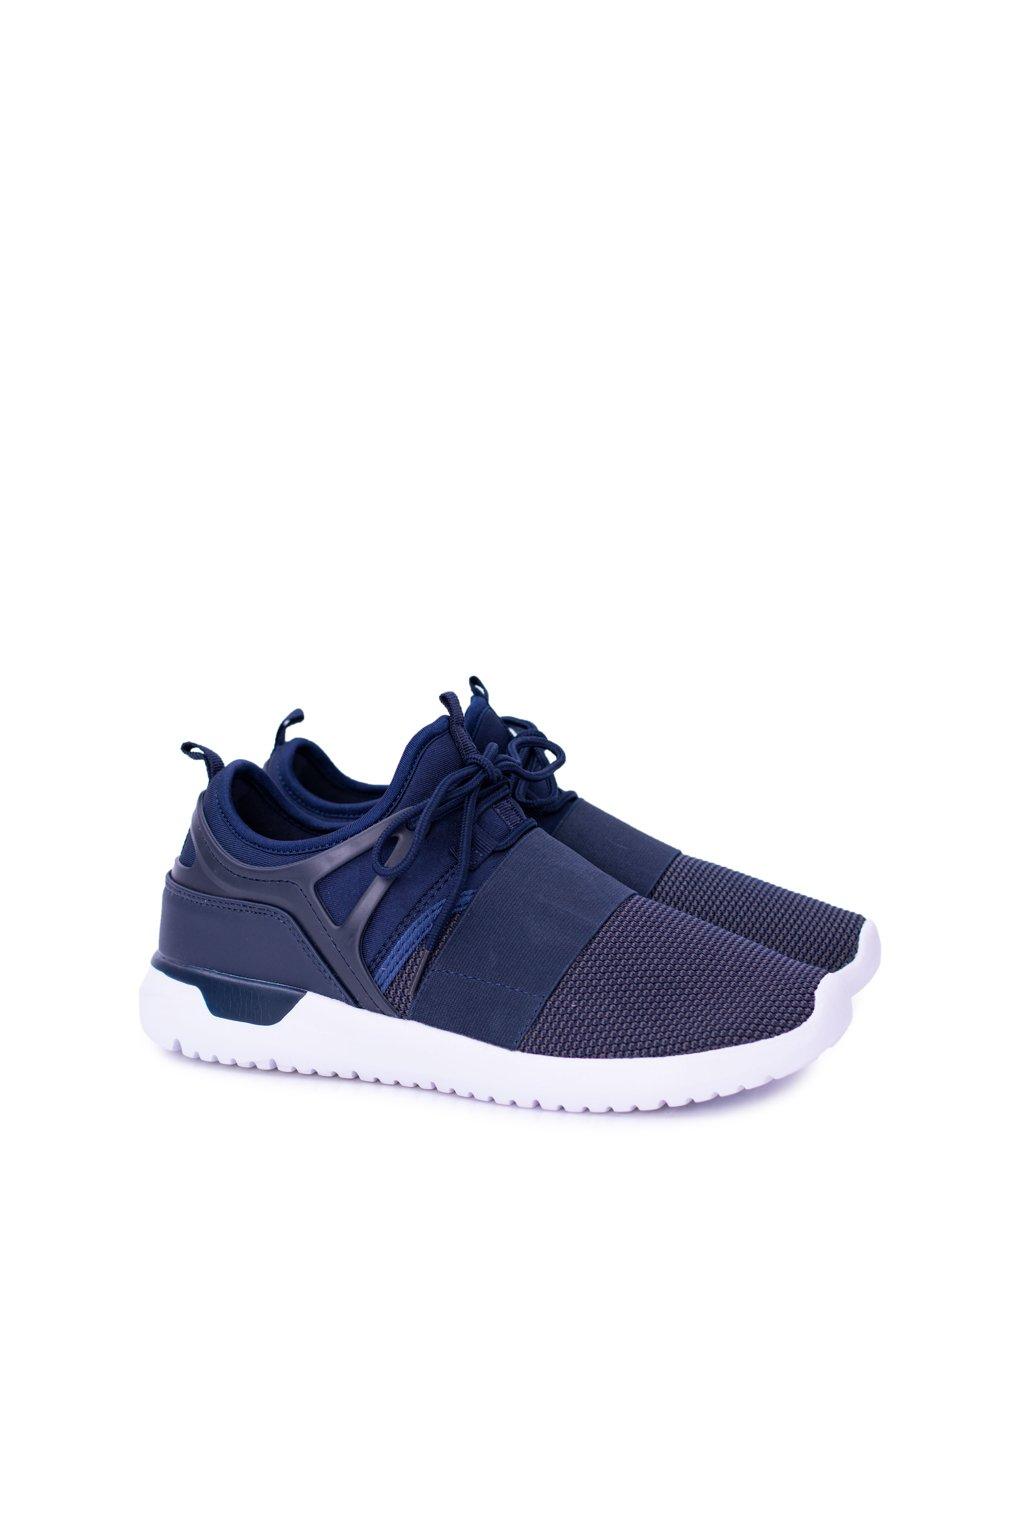 Pánske tmavo modré športové topánky Roveo